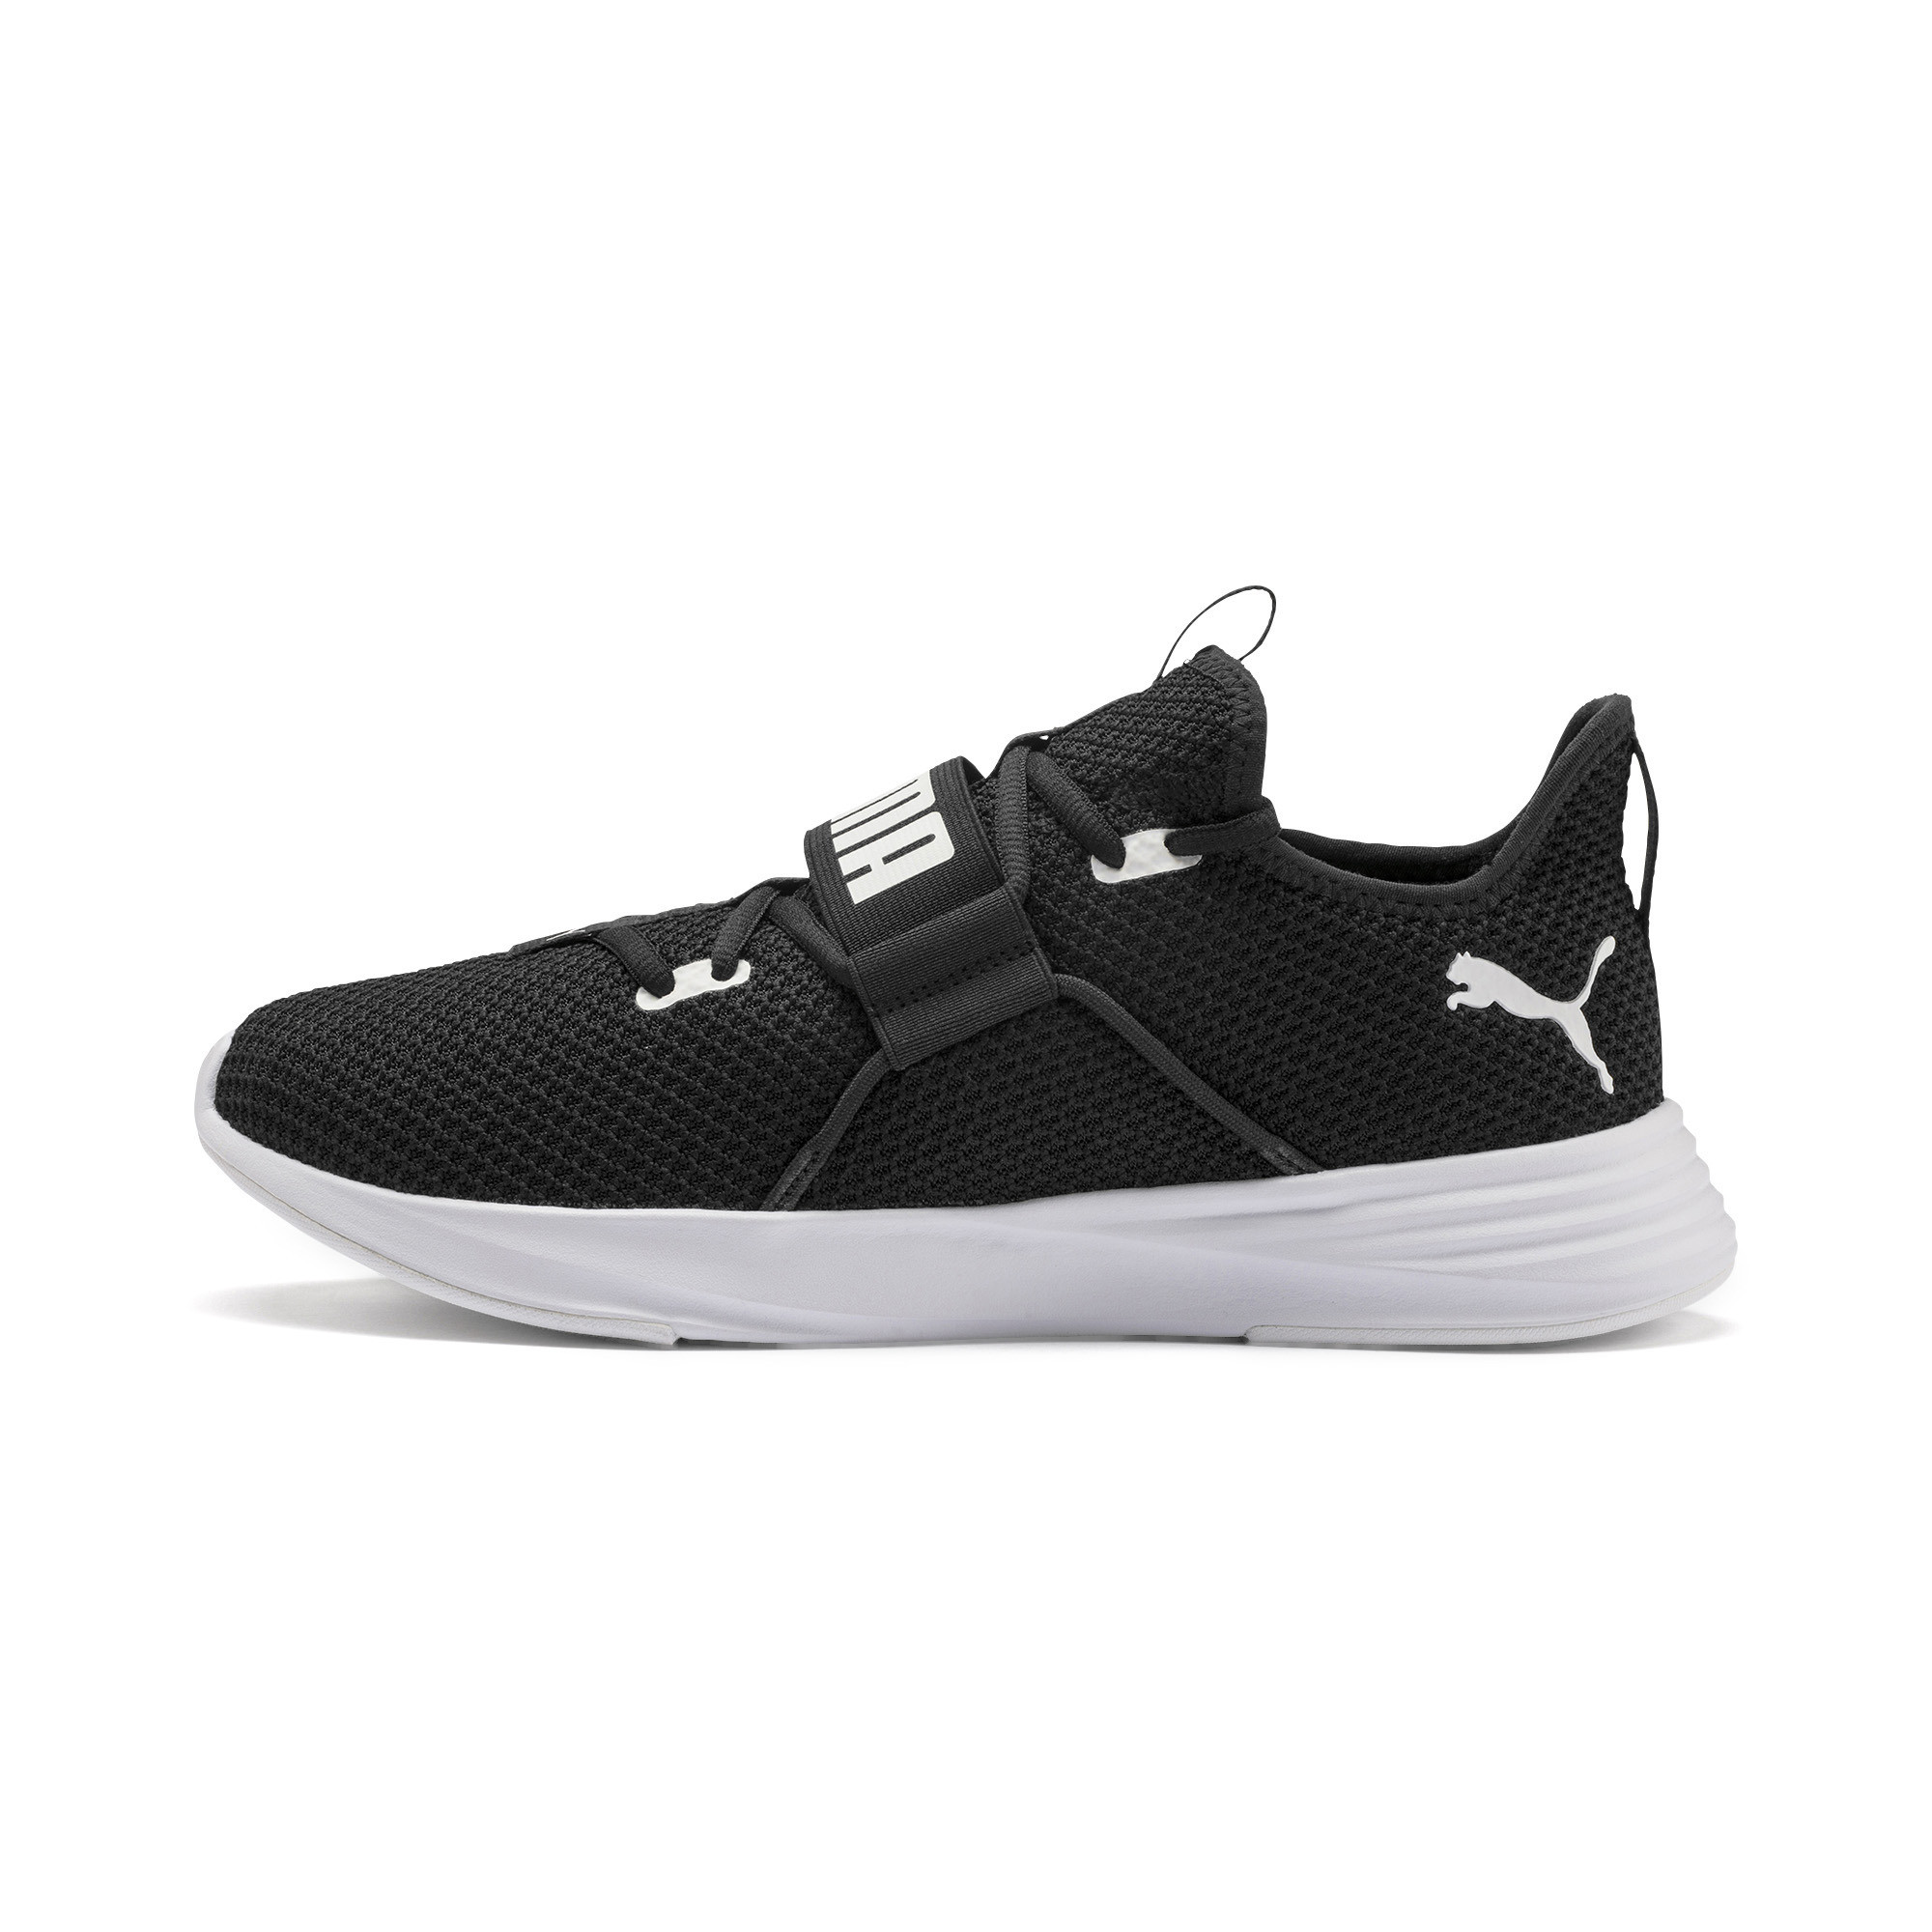 PUMA-Men-039-s-Persist-XT-Knit-Training-Shoes thumbnail 4